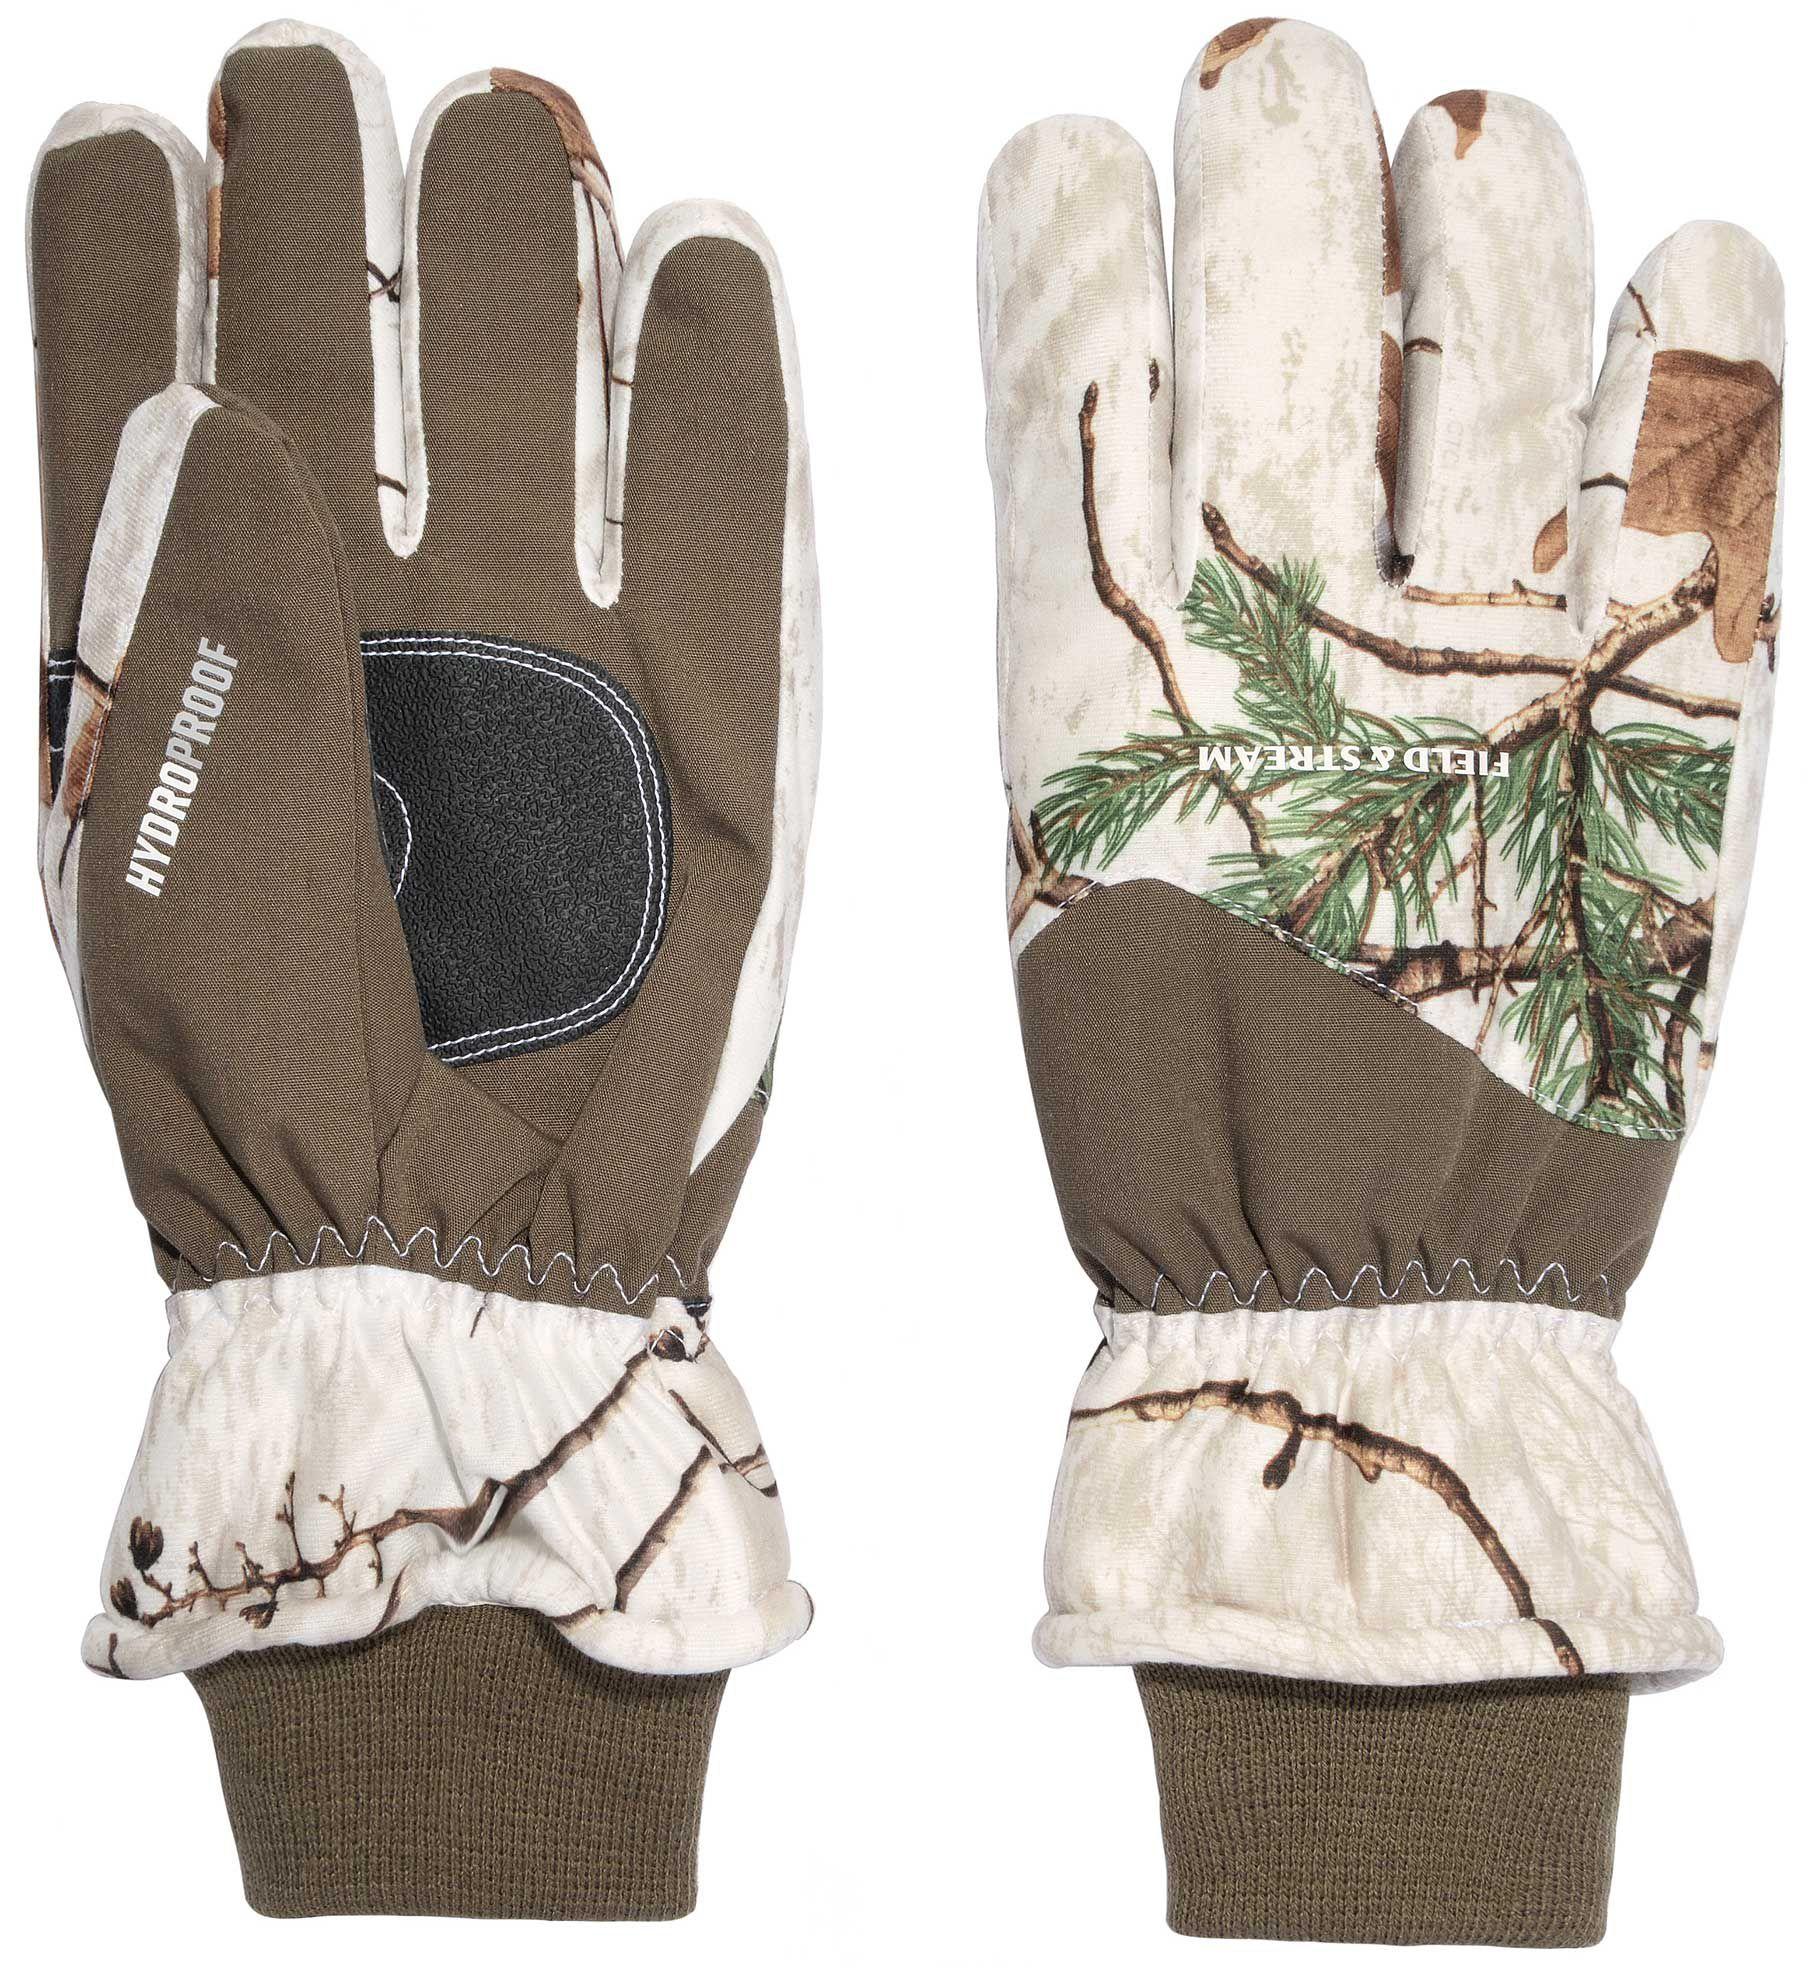 Field & Stream Men's Pursuit Hunting Glove, Size: Large, Multi